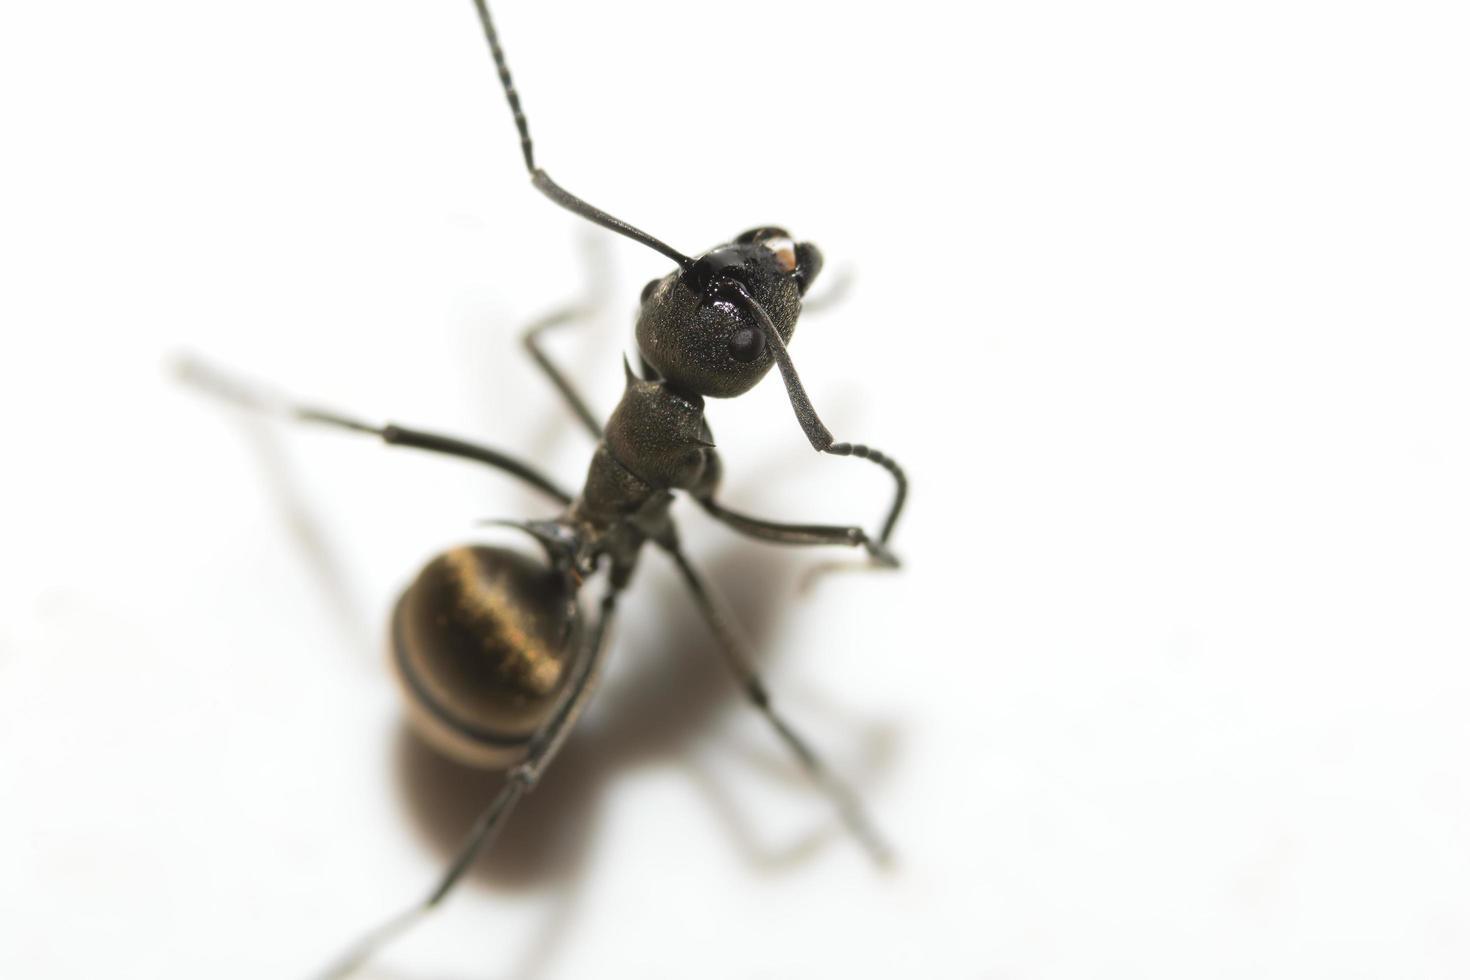 formica nera su sfondo bianco foto